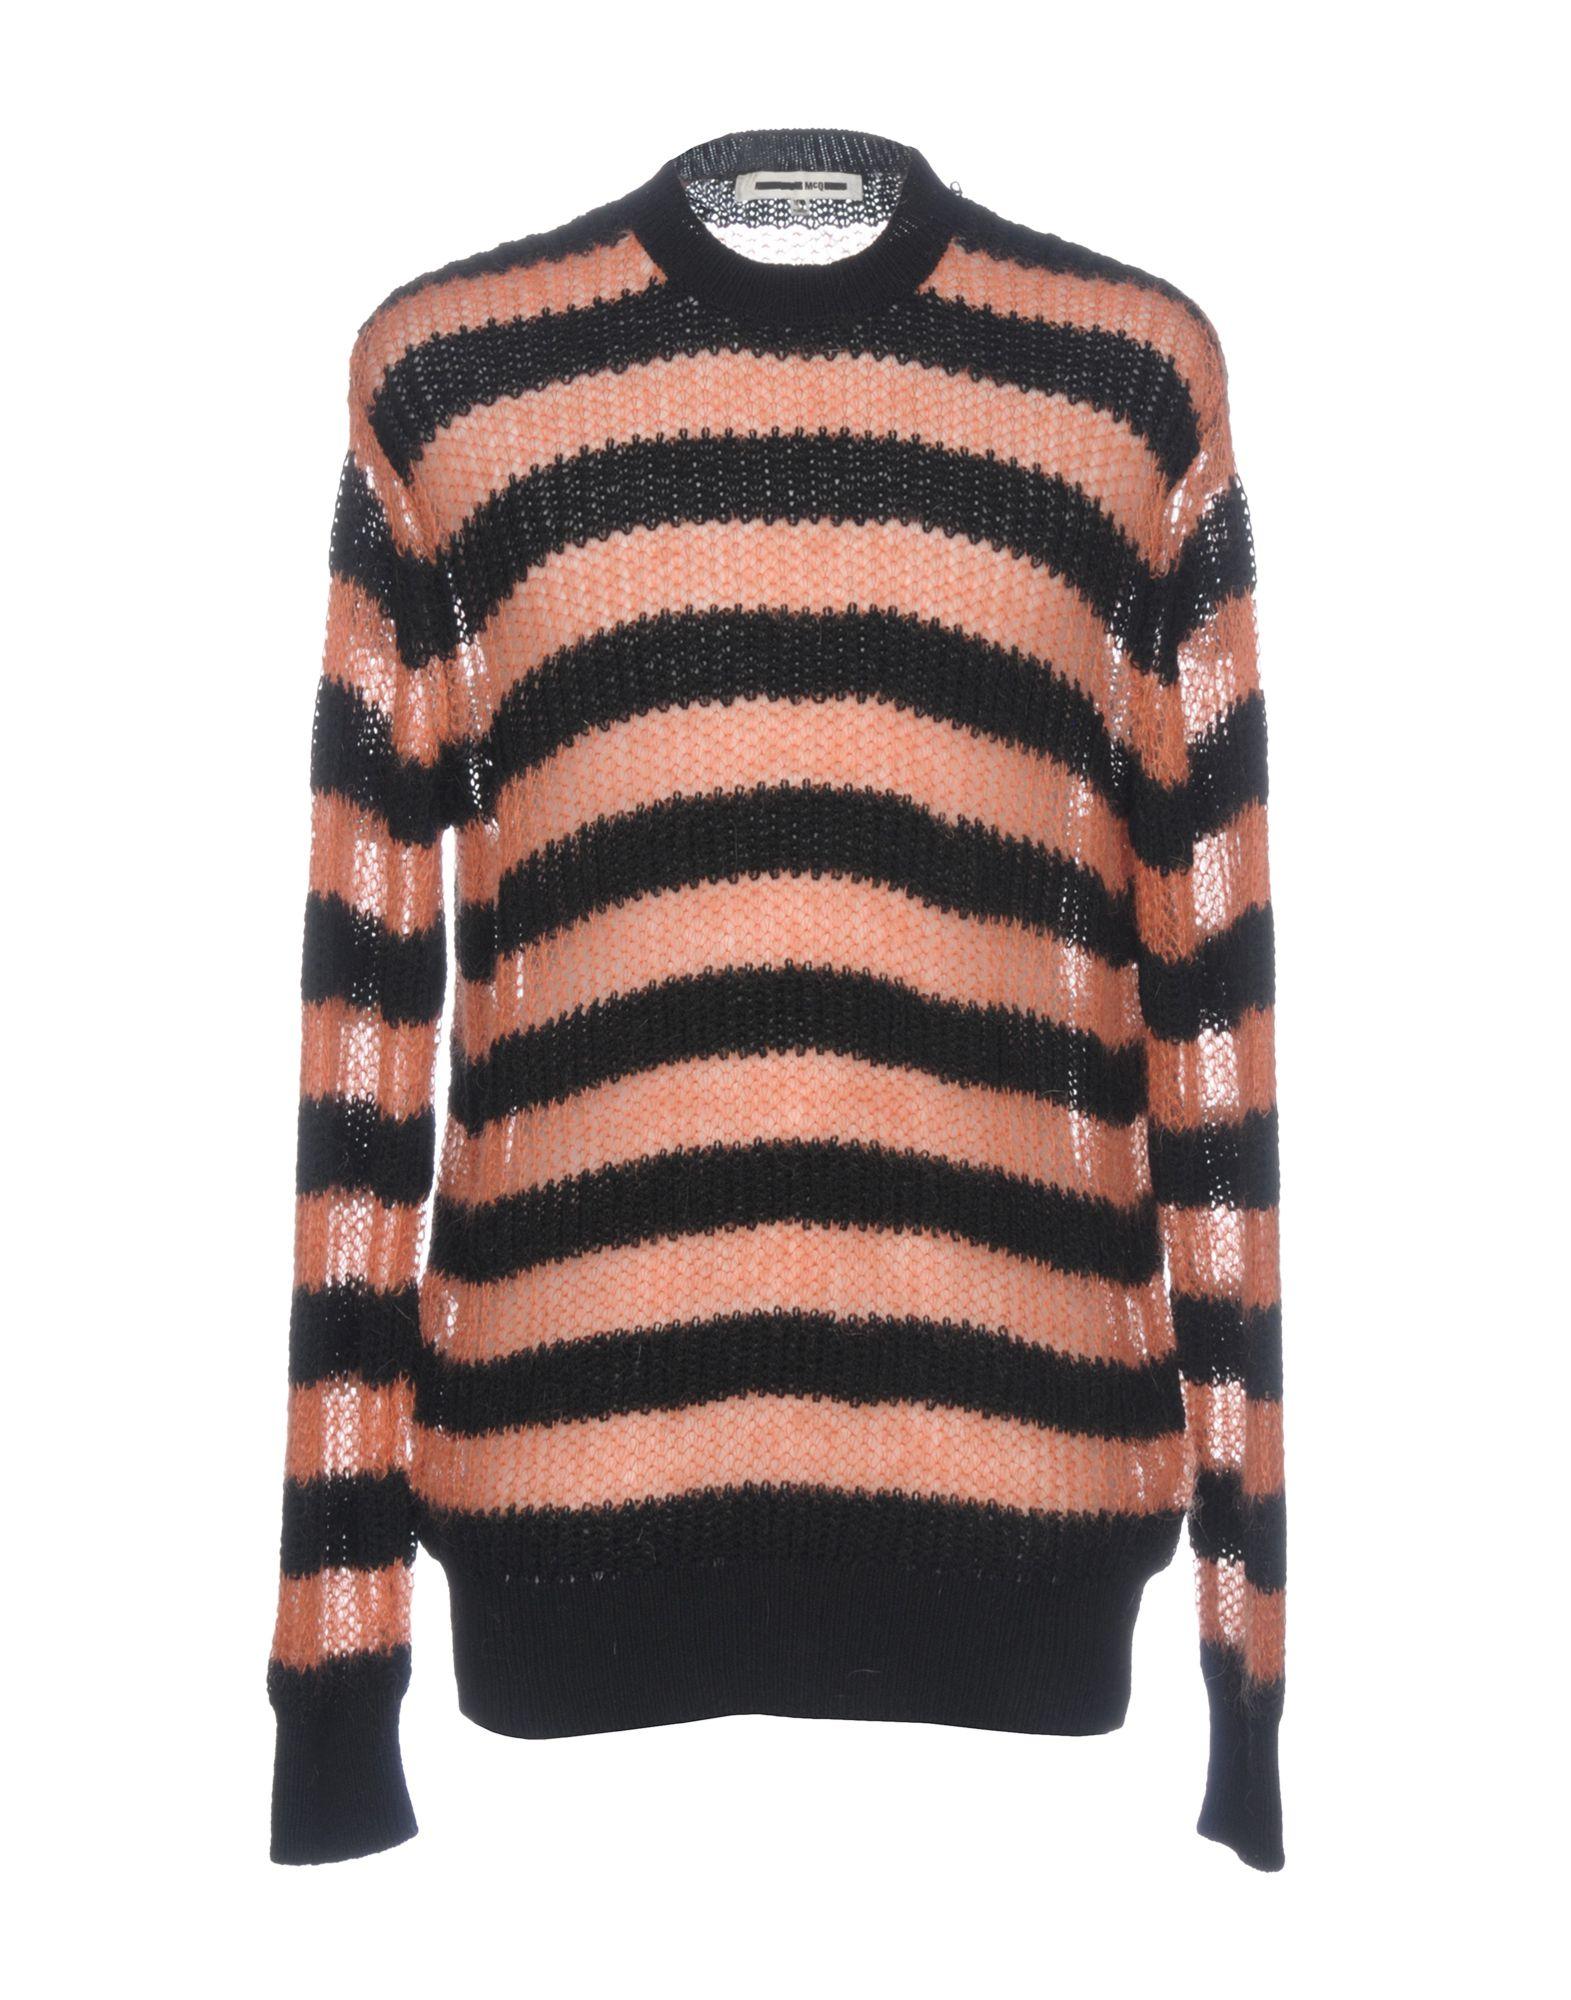 McQ Alexander McQueen Свитер мужской свитер в полоску 52